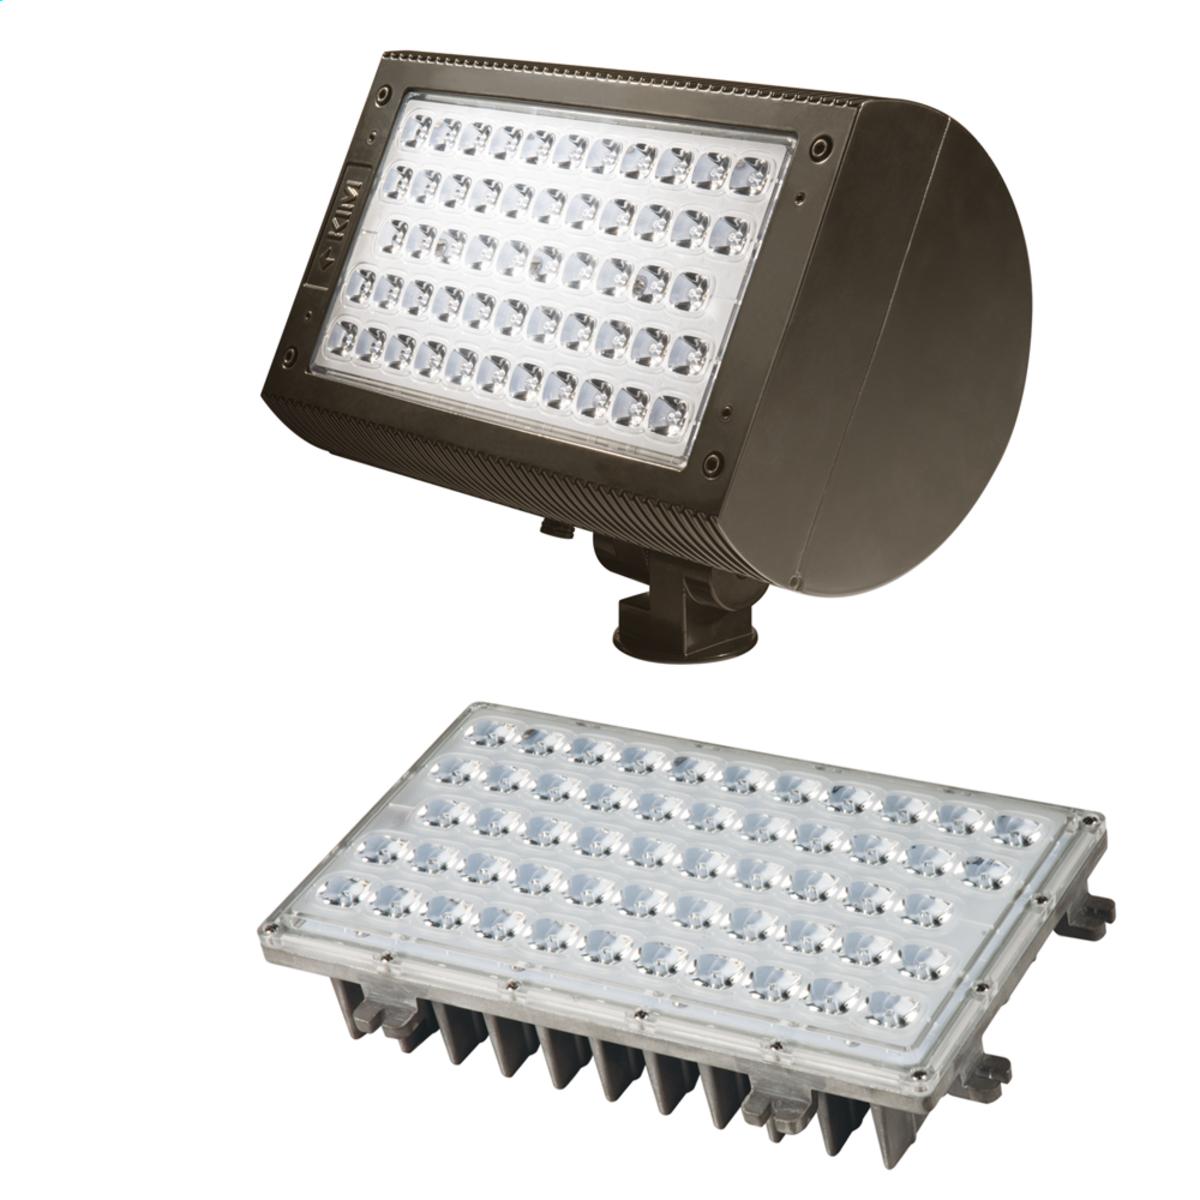 Led retrofit kits commercial outdoor lighting lighting afl10 led kit workwithnaturefo